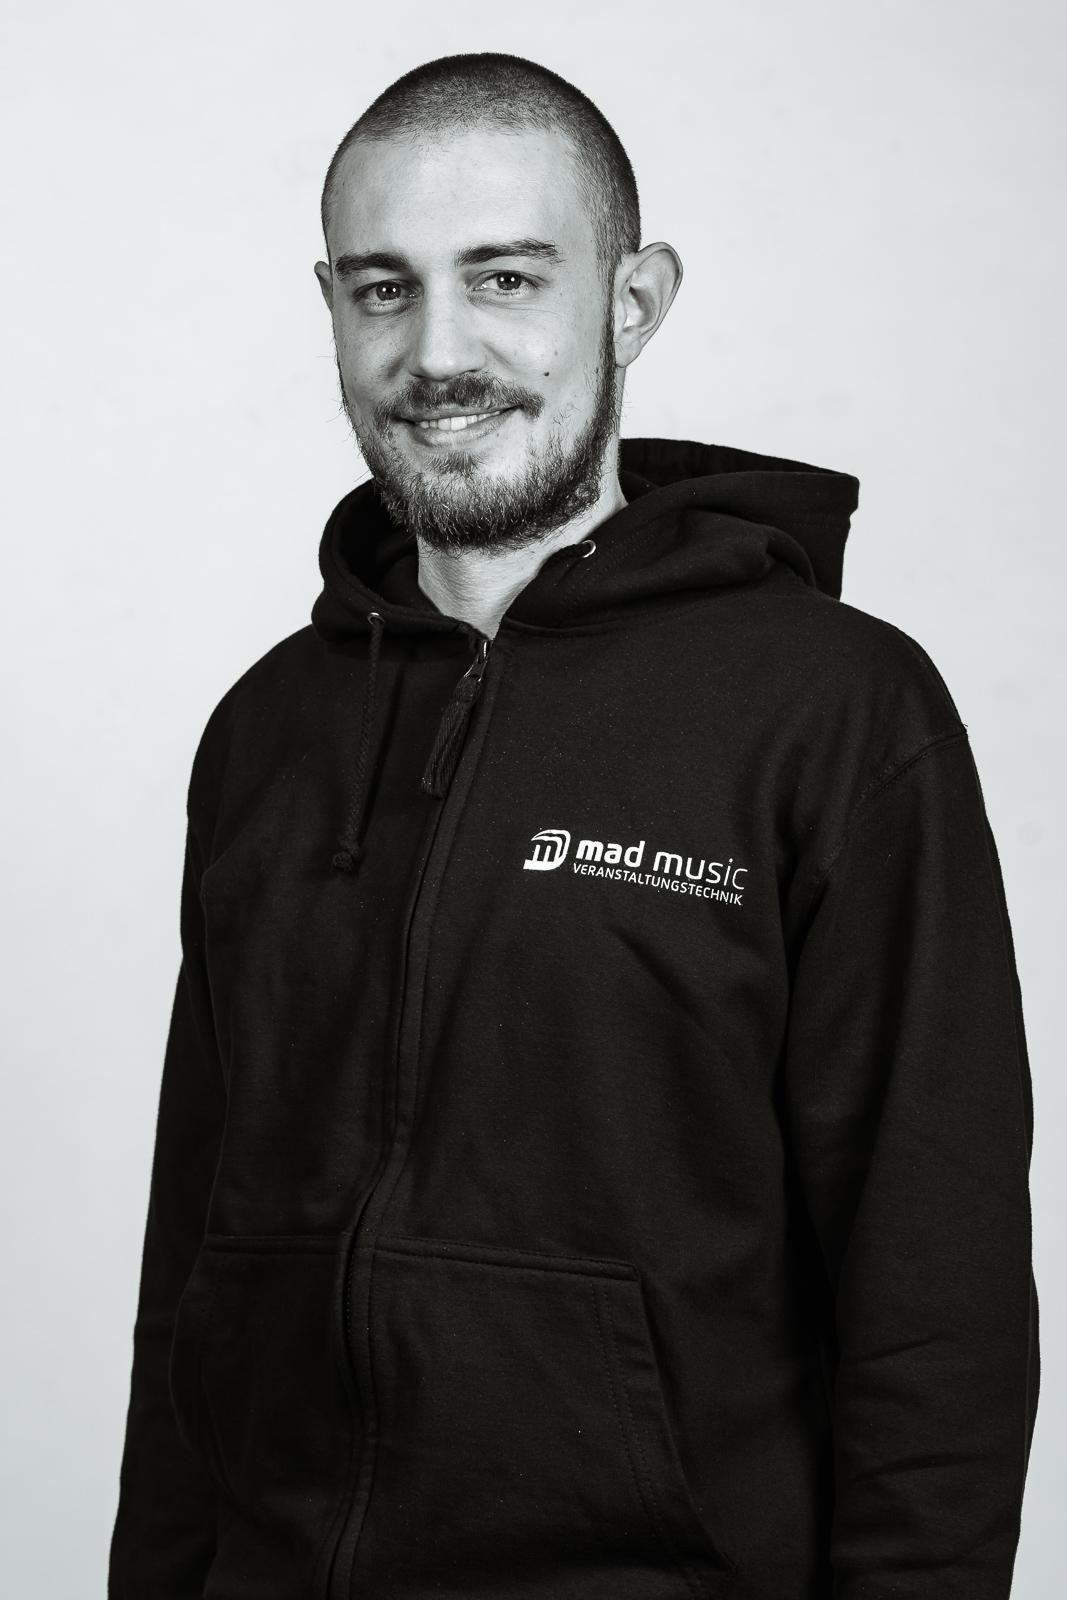 Simon Schwalb